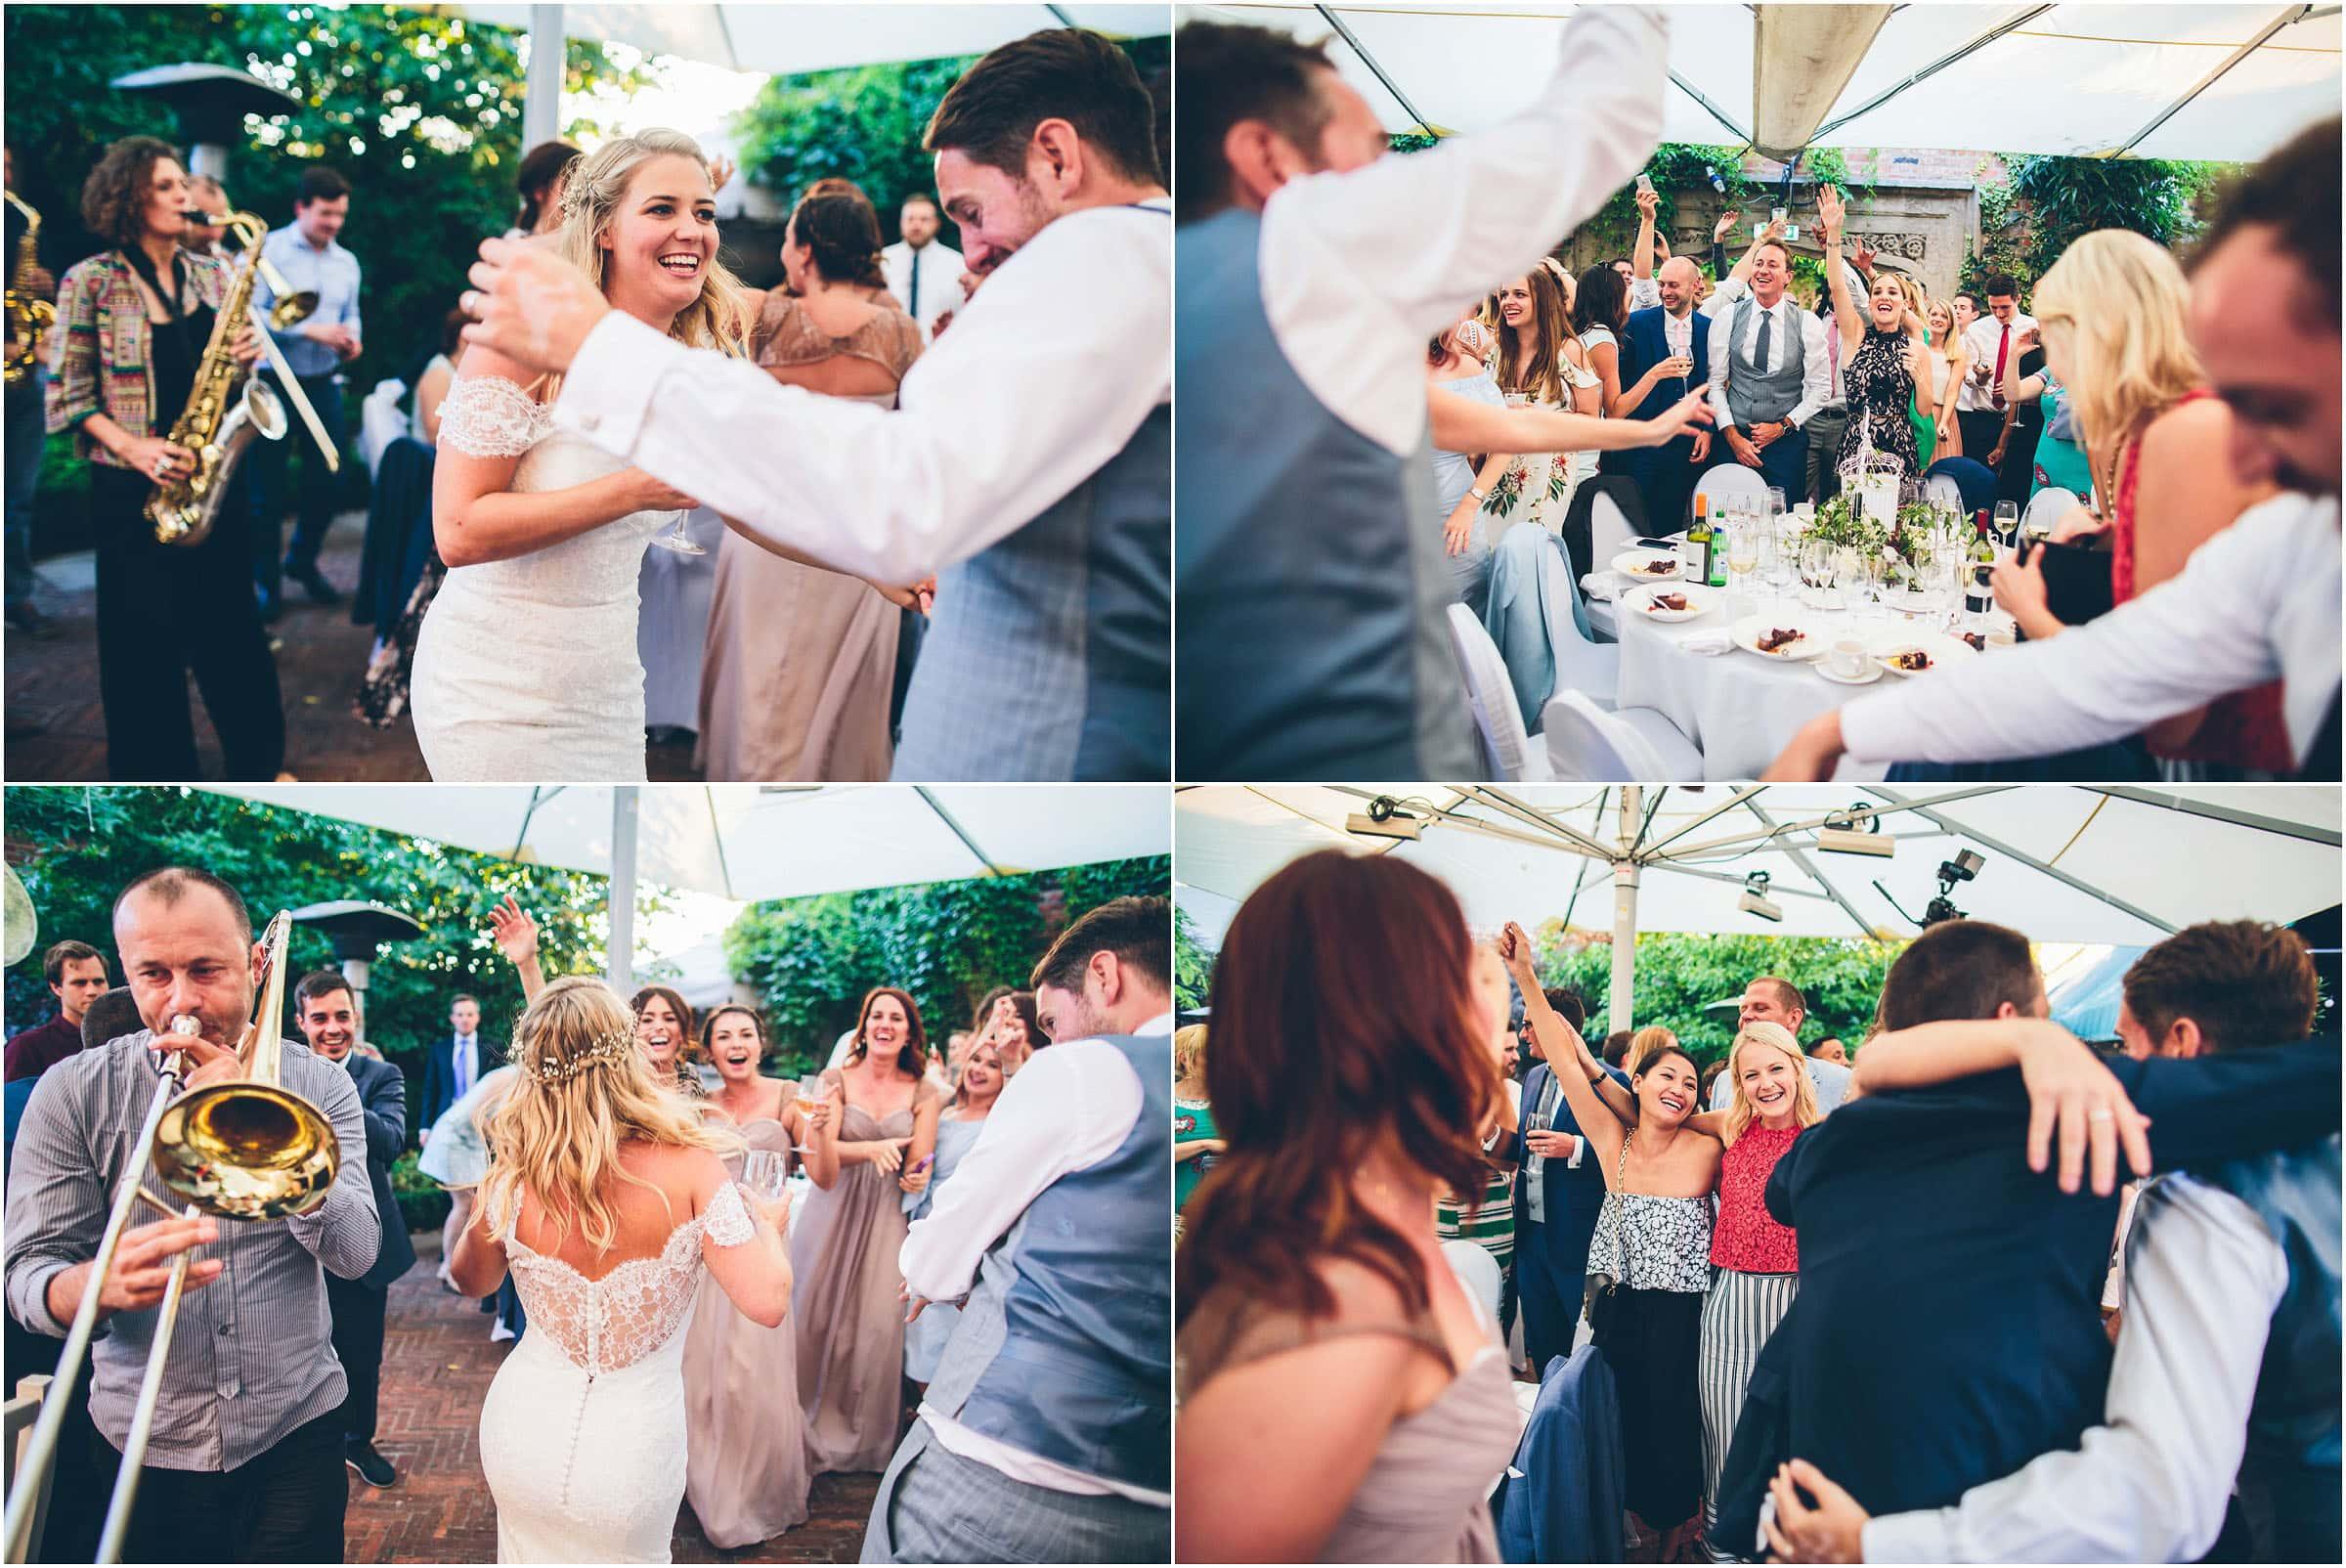 Kensington_Roof_Gardens_Wedding_Photography_0109